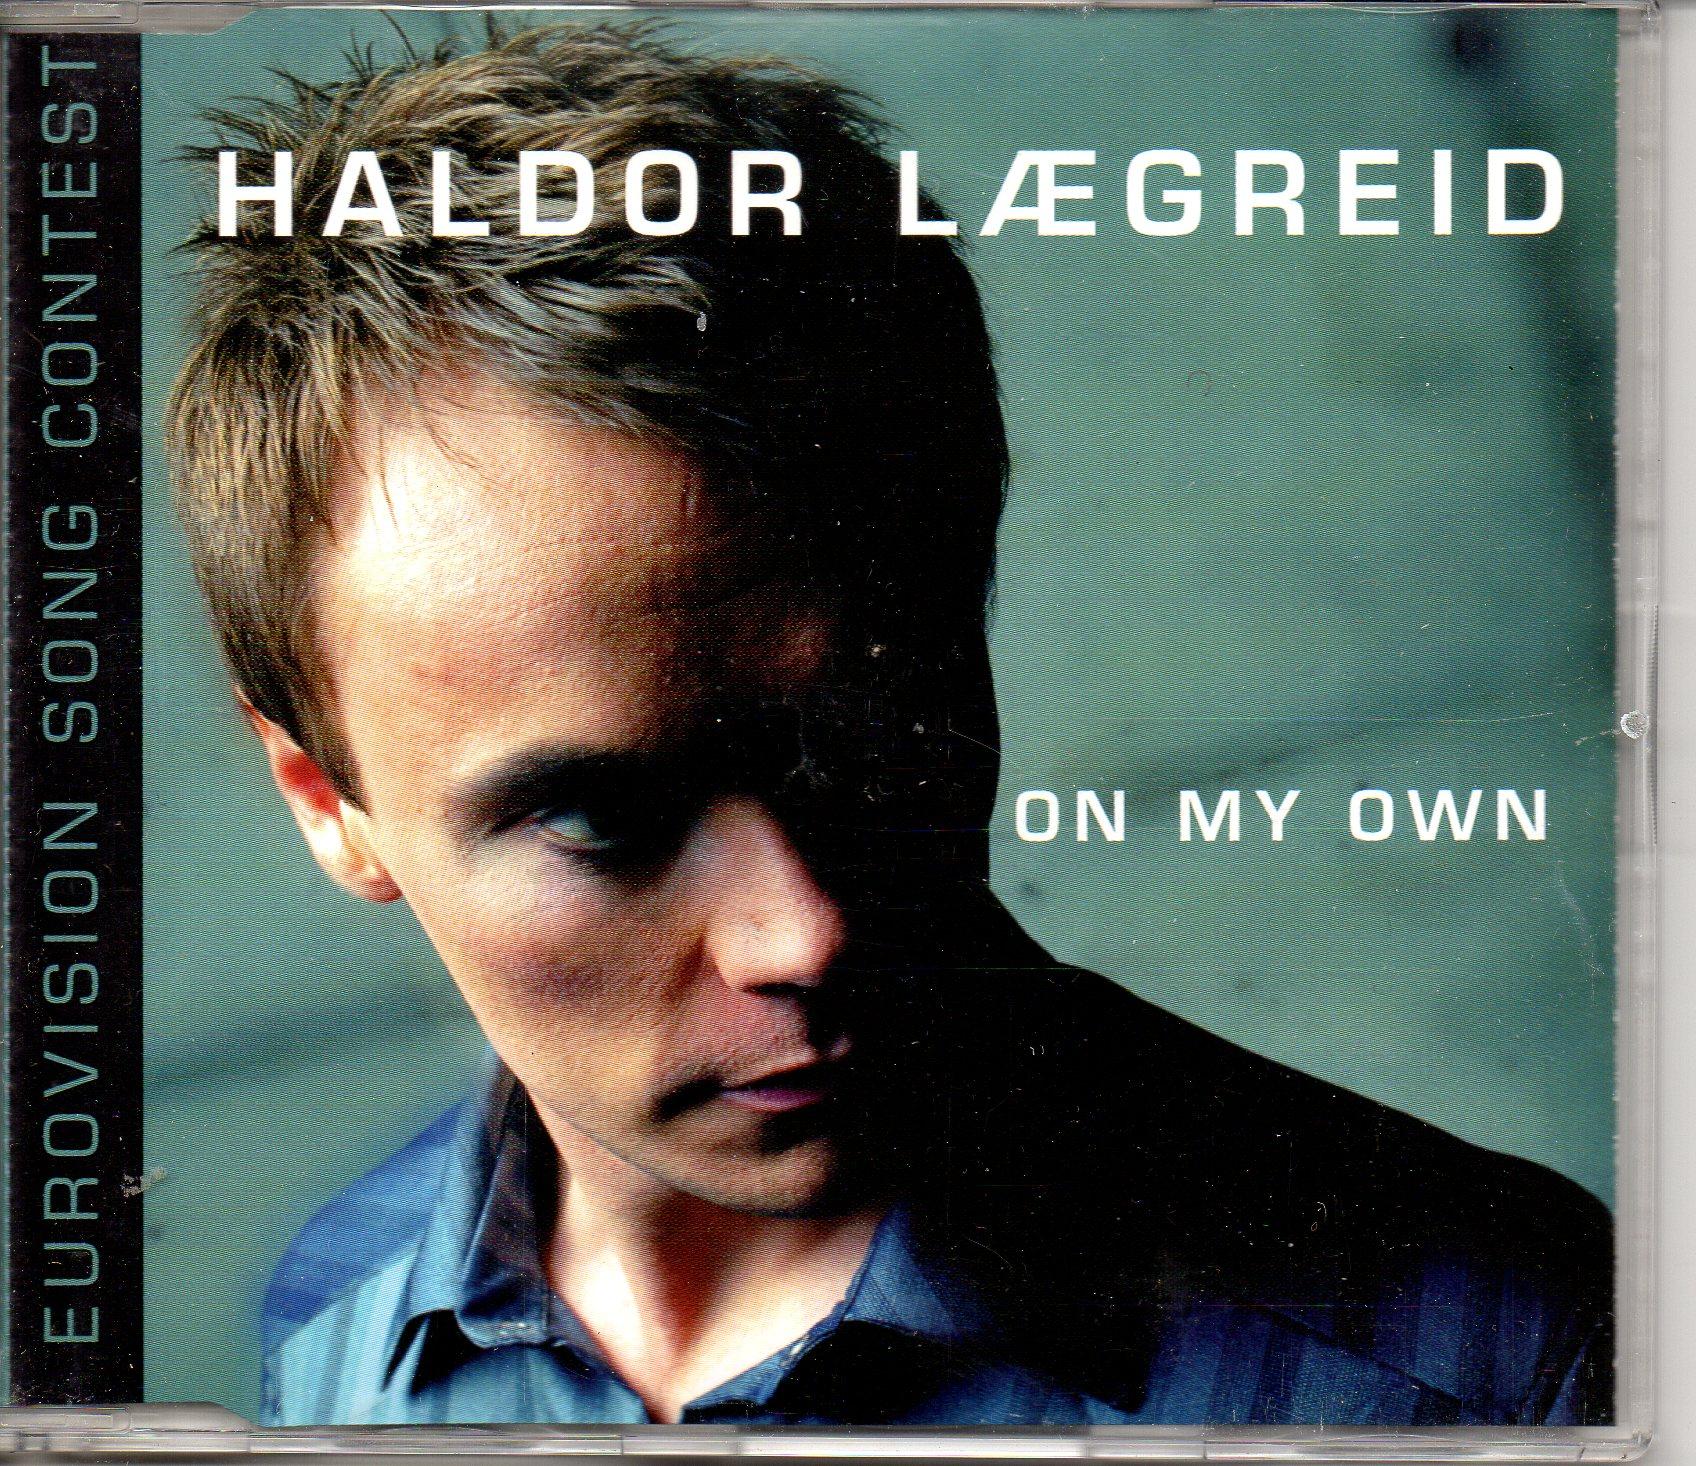 EUROVISION 2001 NORVÈGE : HALDOR LÆGREID - On my own 2-track Jewel case - CD Maxi